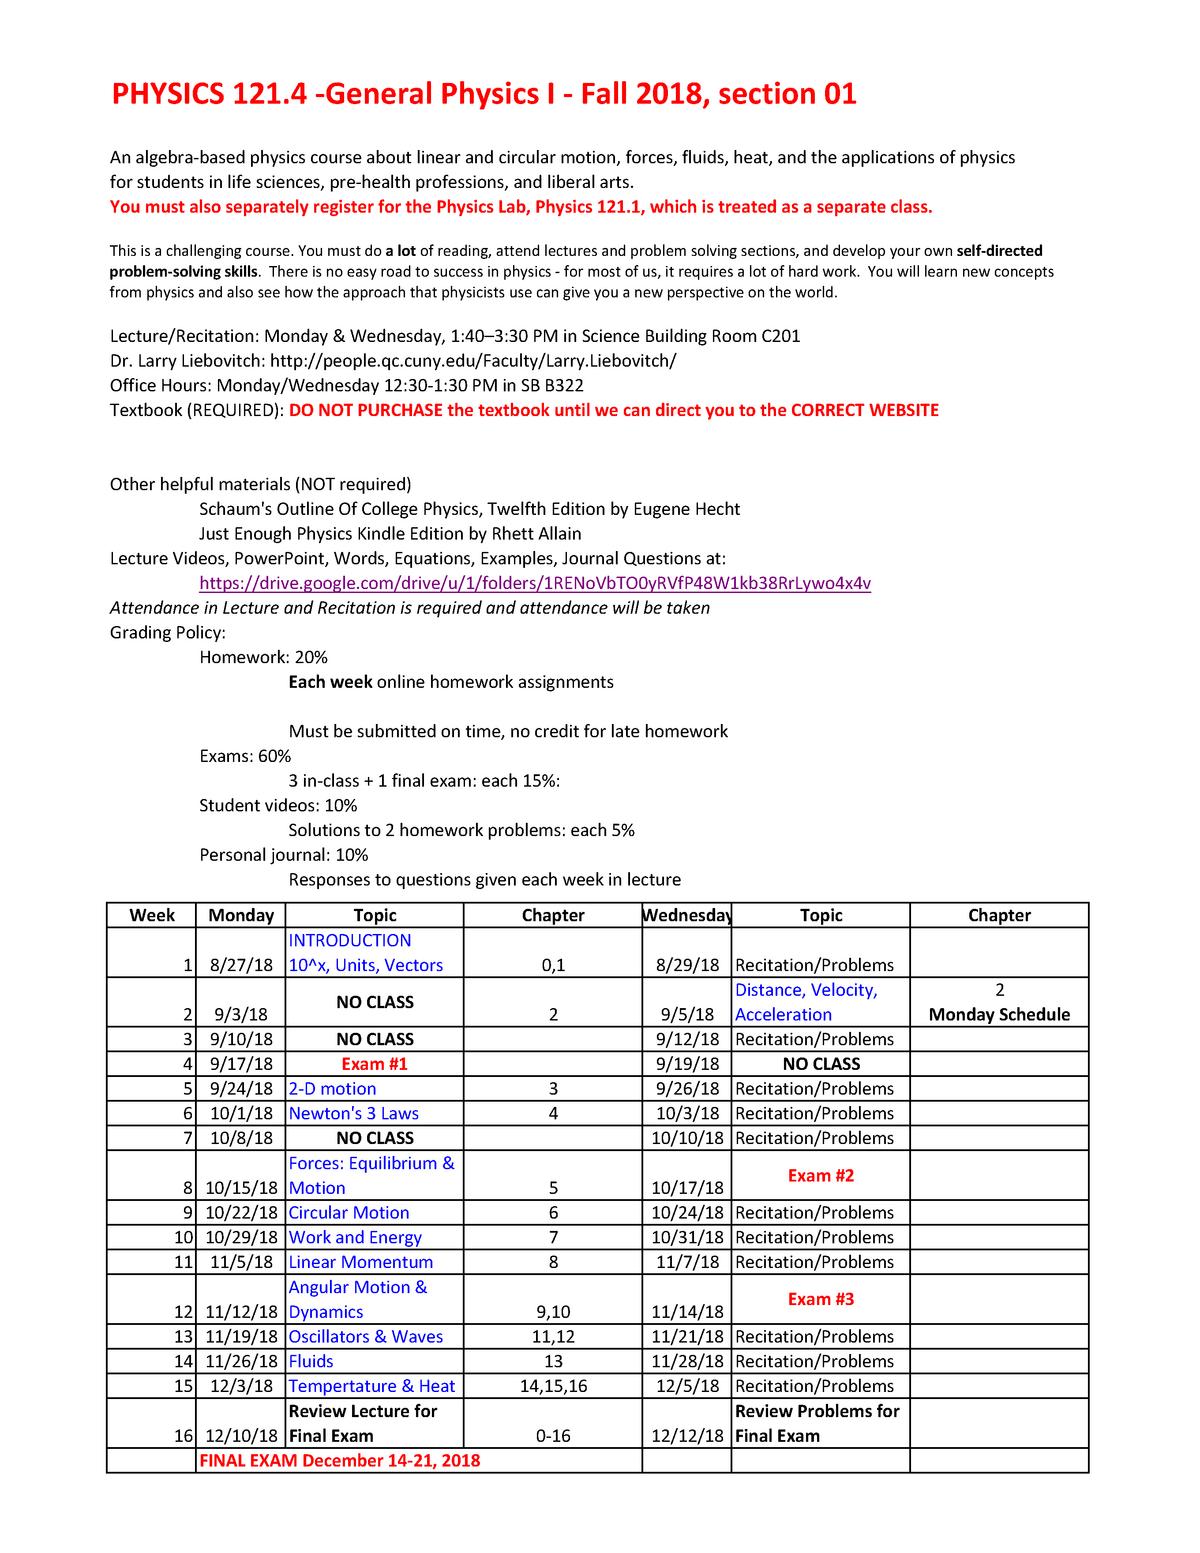 Syllabus-PH1214-Fall2018 - PHYS 1214 General Physics I - StuDocu